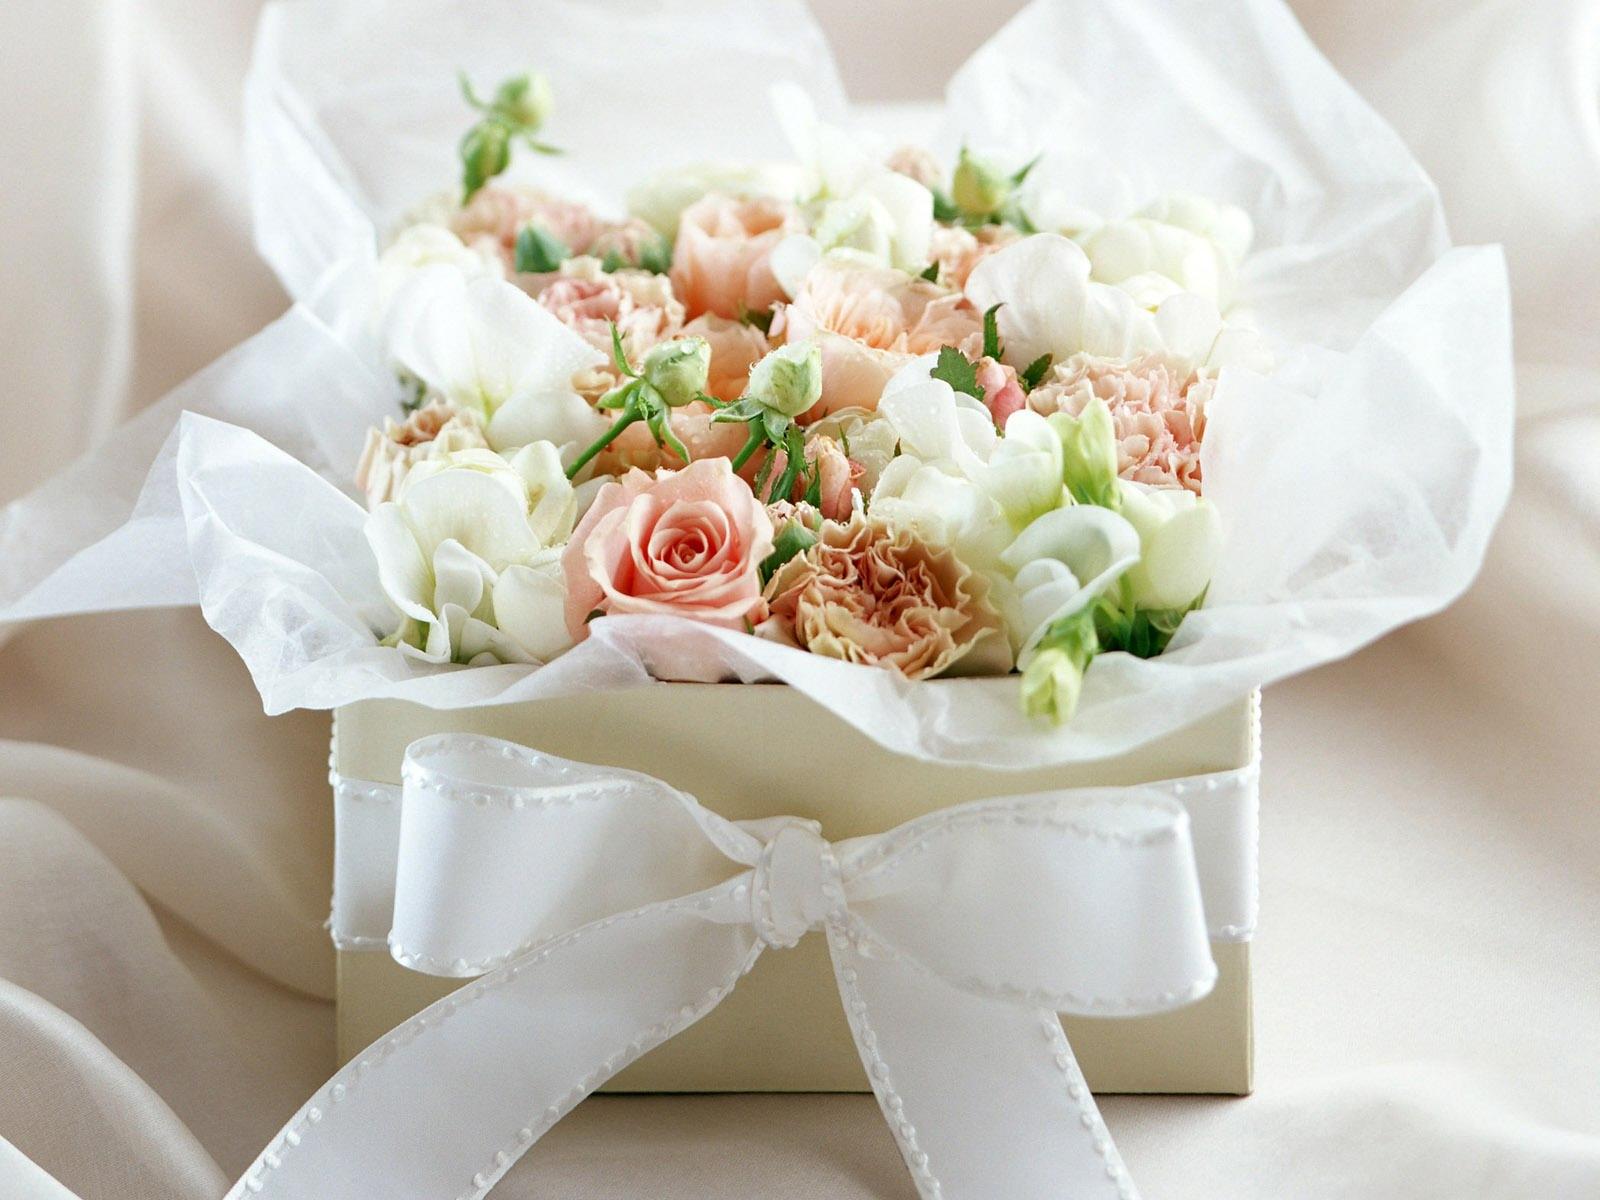 About Flowers Design School